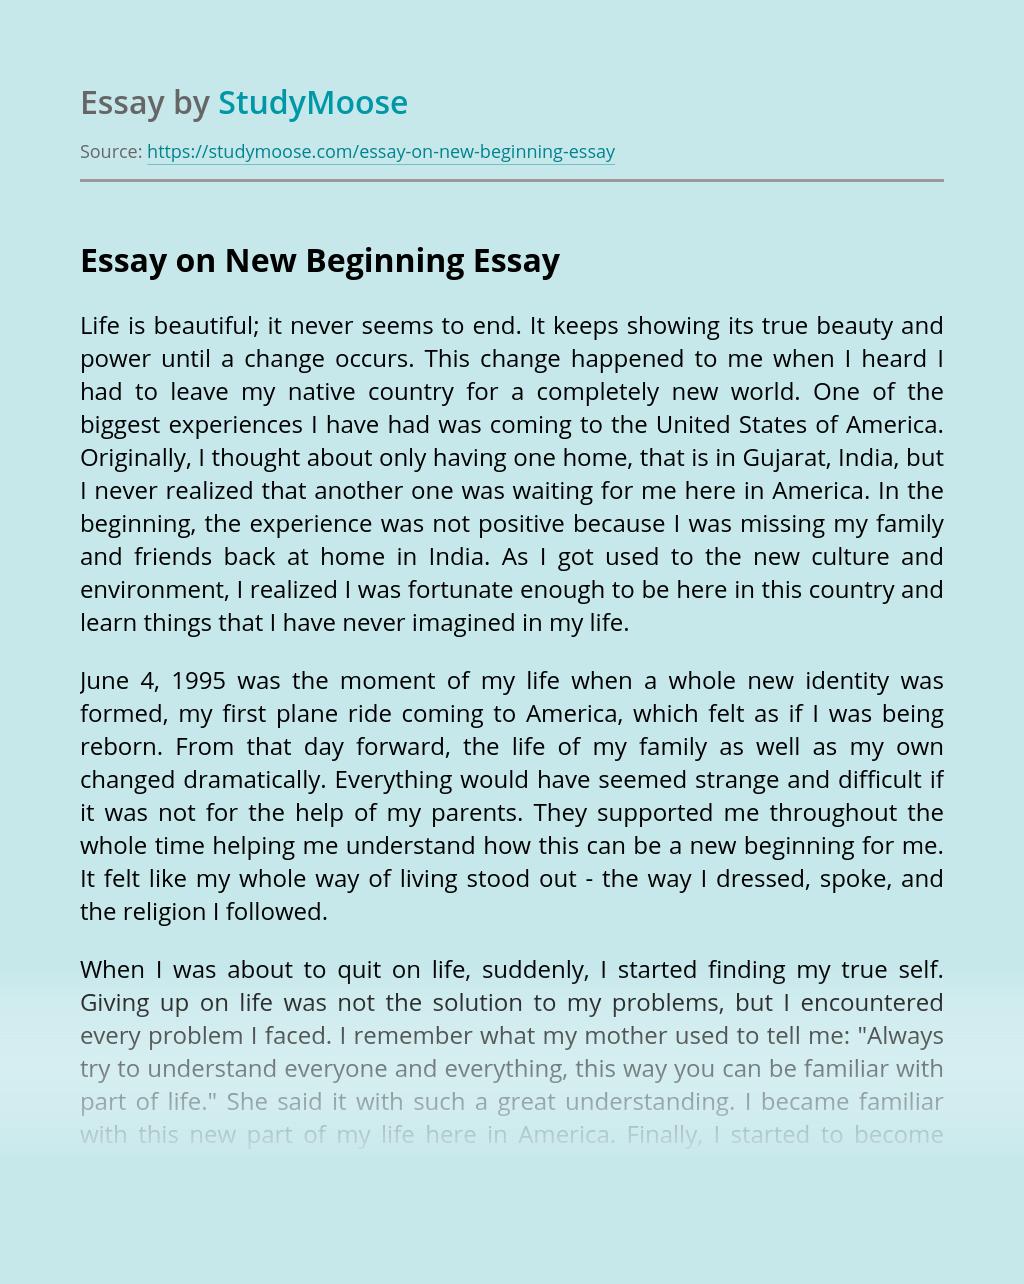 Essay on New Beginning